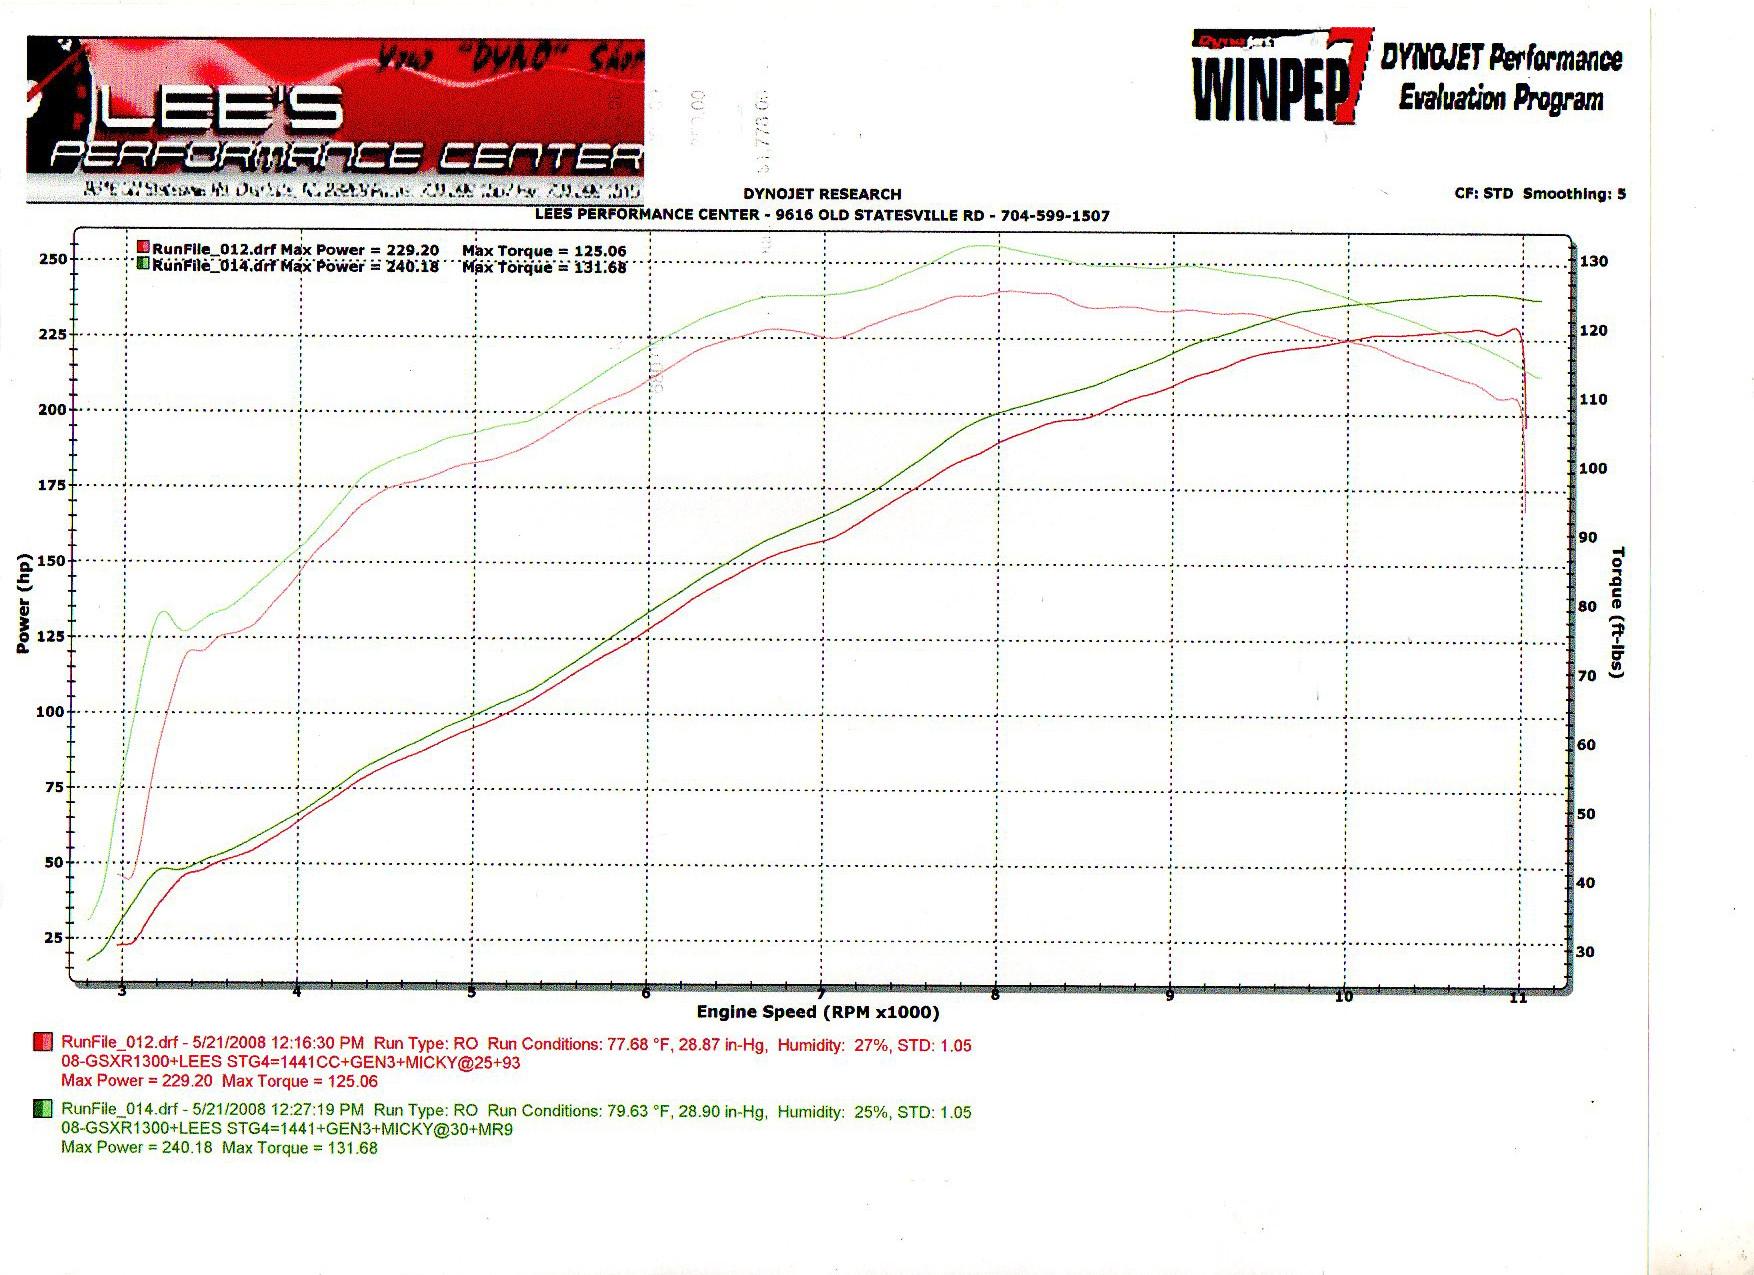 08-gsx1300r-stg4010-dyno-graph-lees.jpg